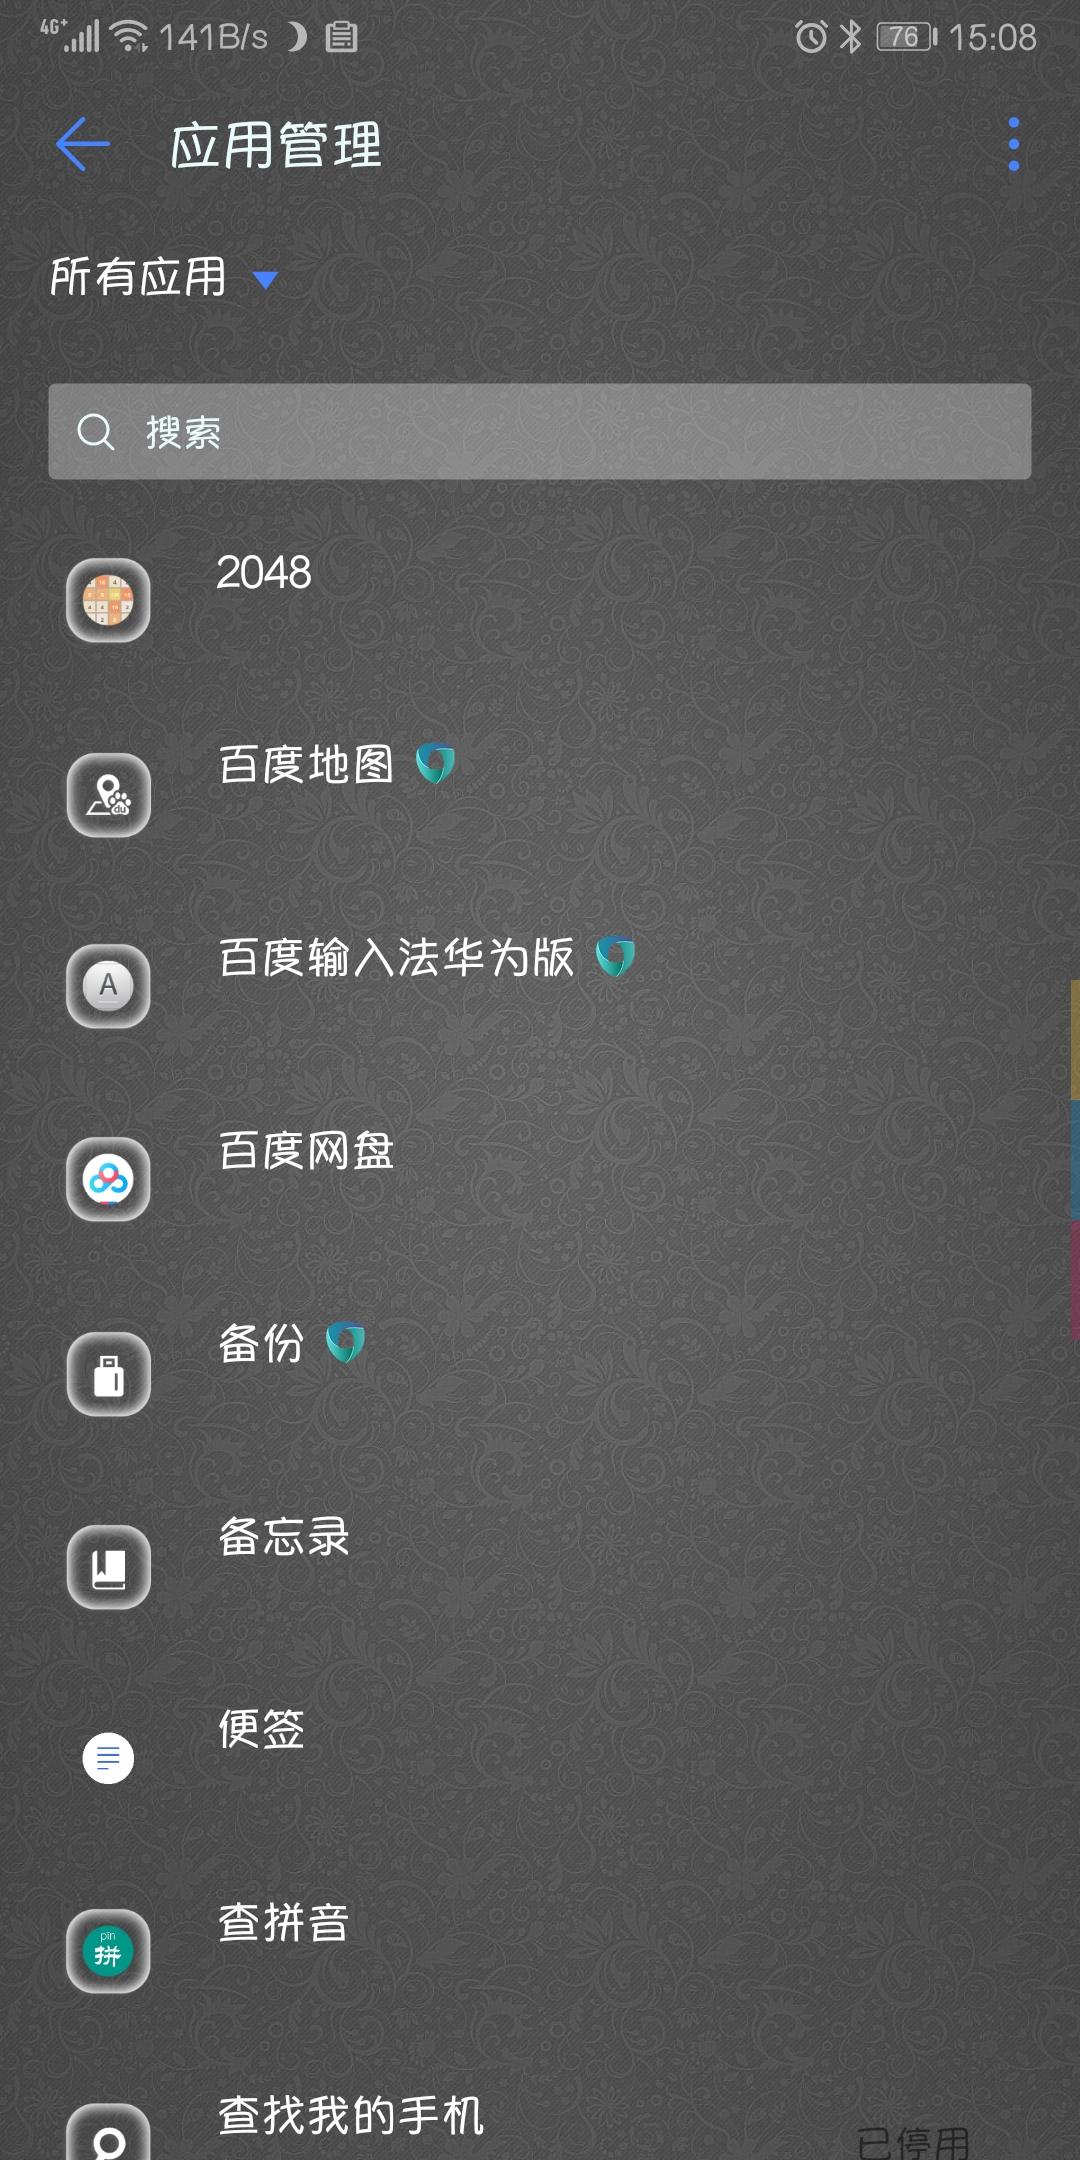 Screenshot_20190108_150817_com.android.settings.jpg